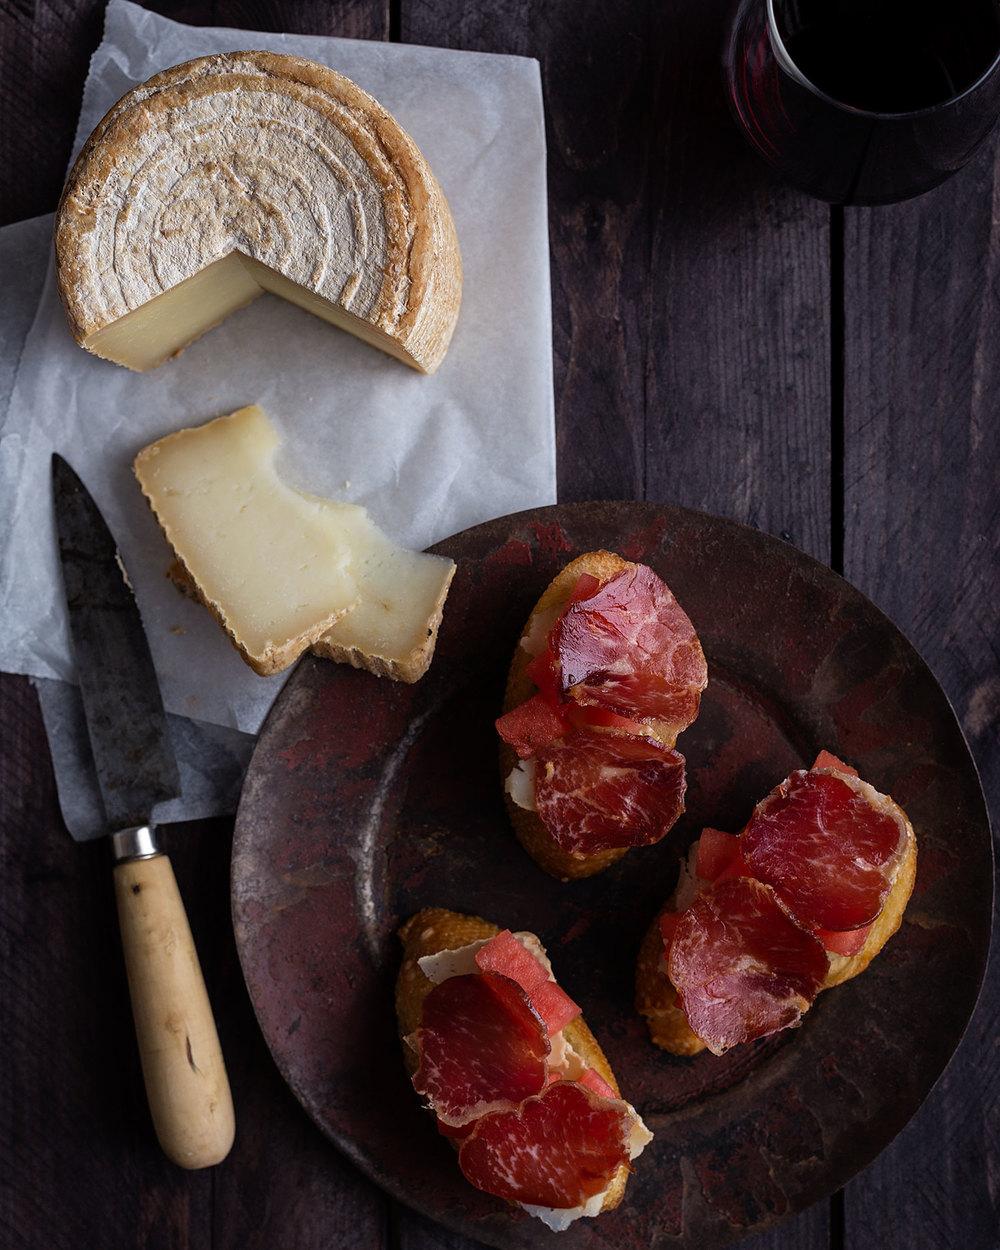 corina-landa-food-photography-fotografia-gastronomica-34.jpg